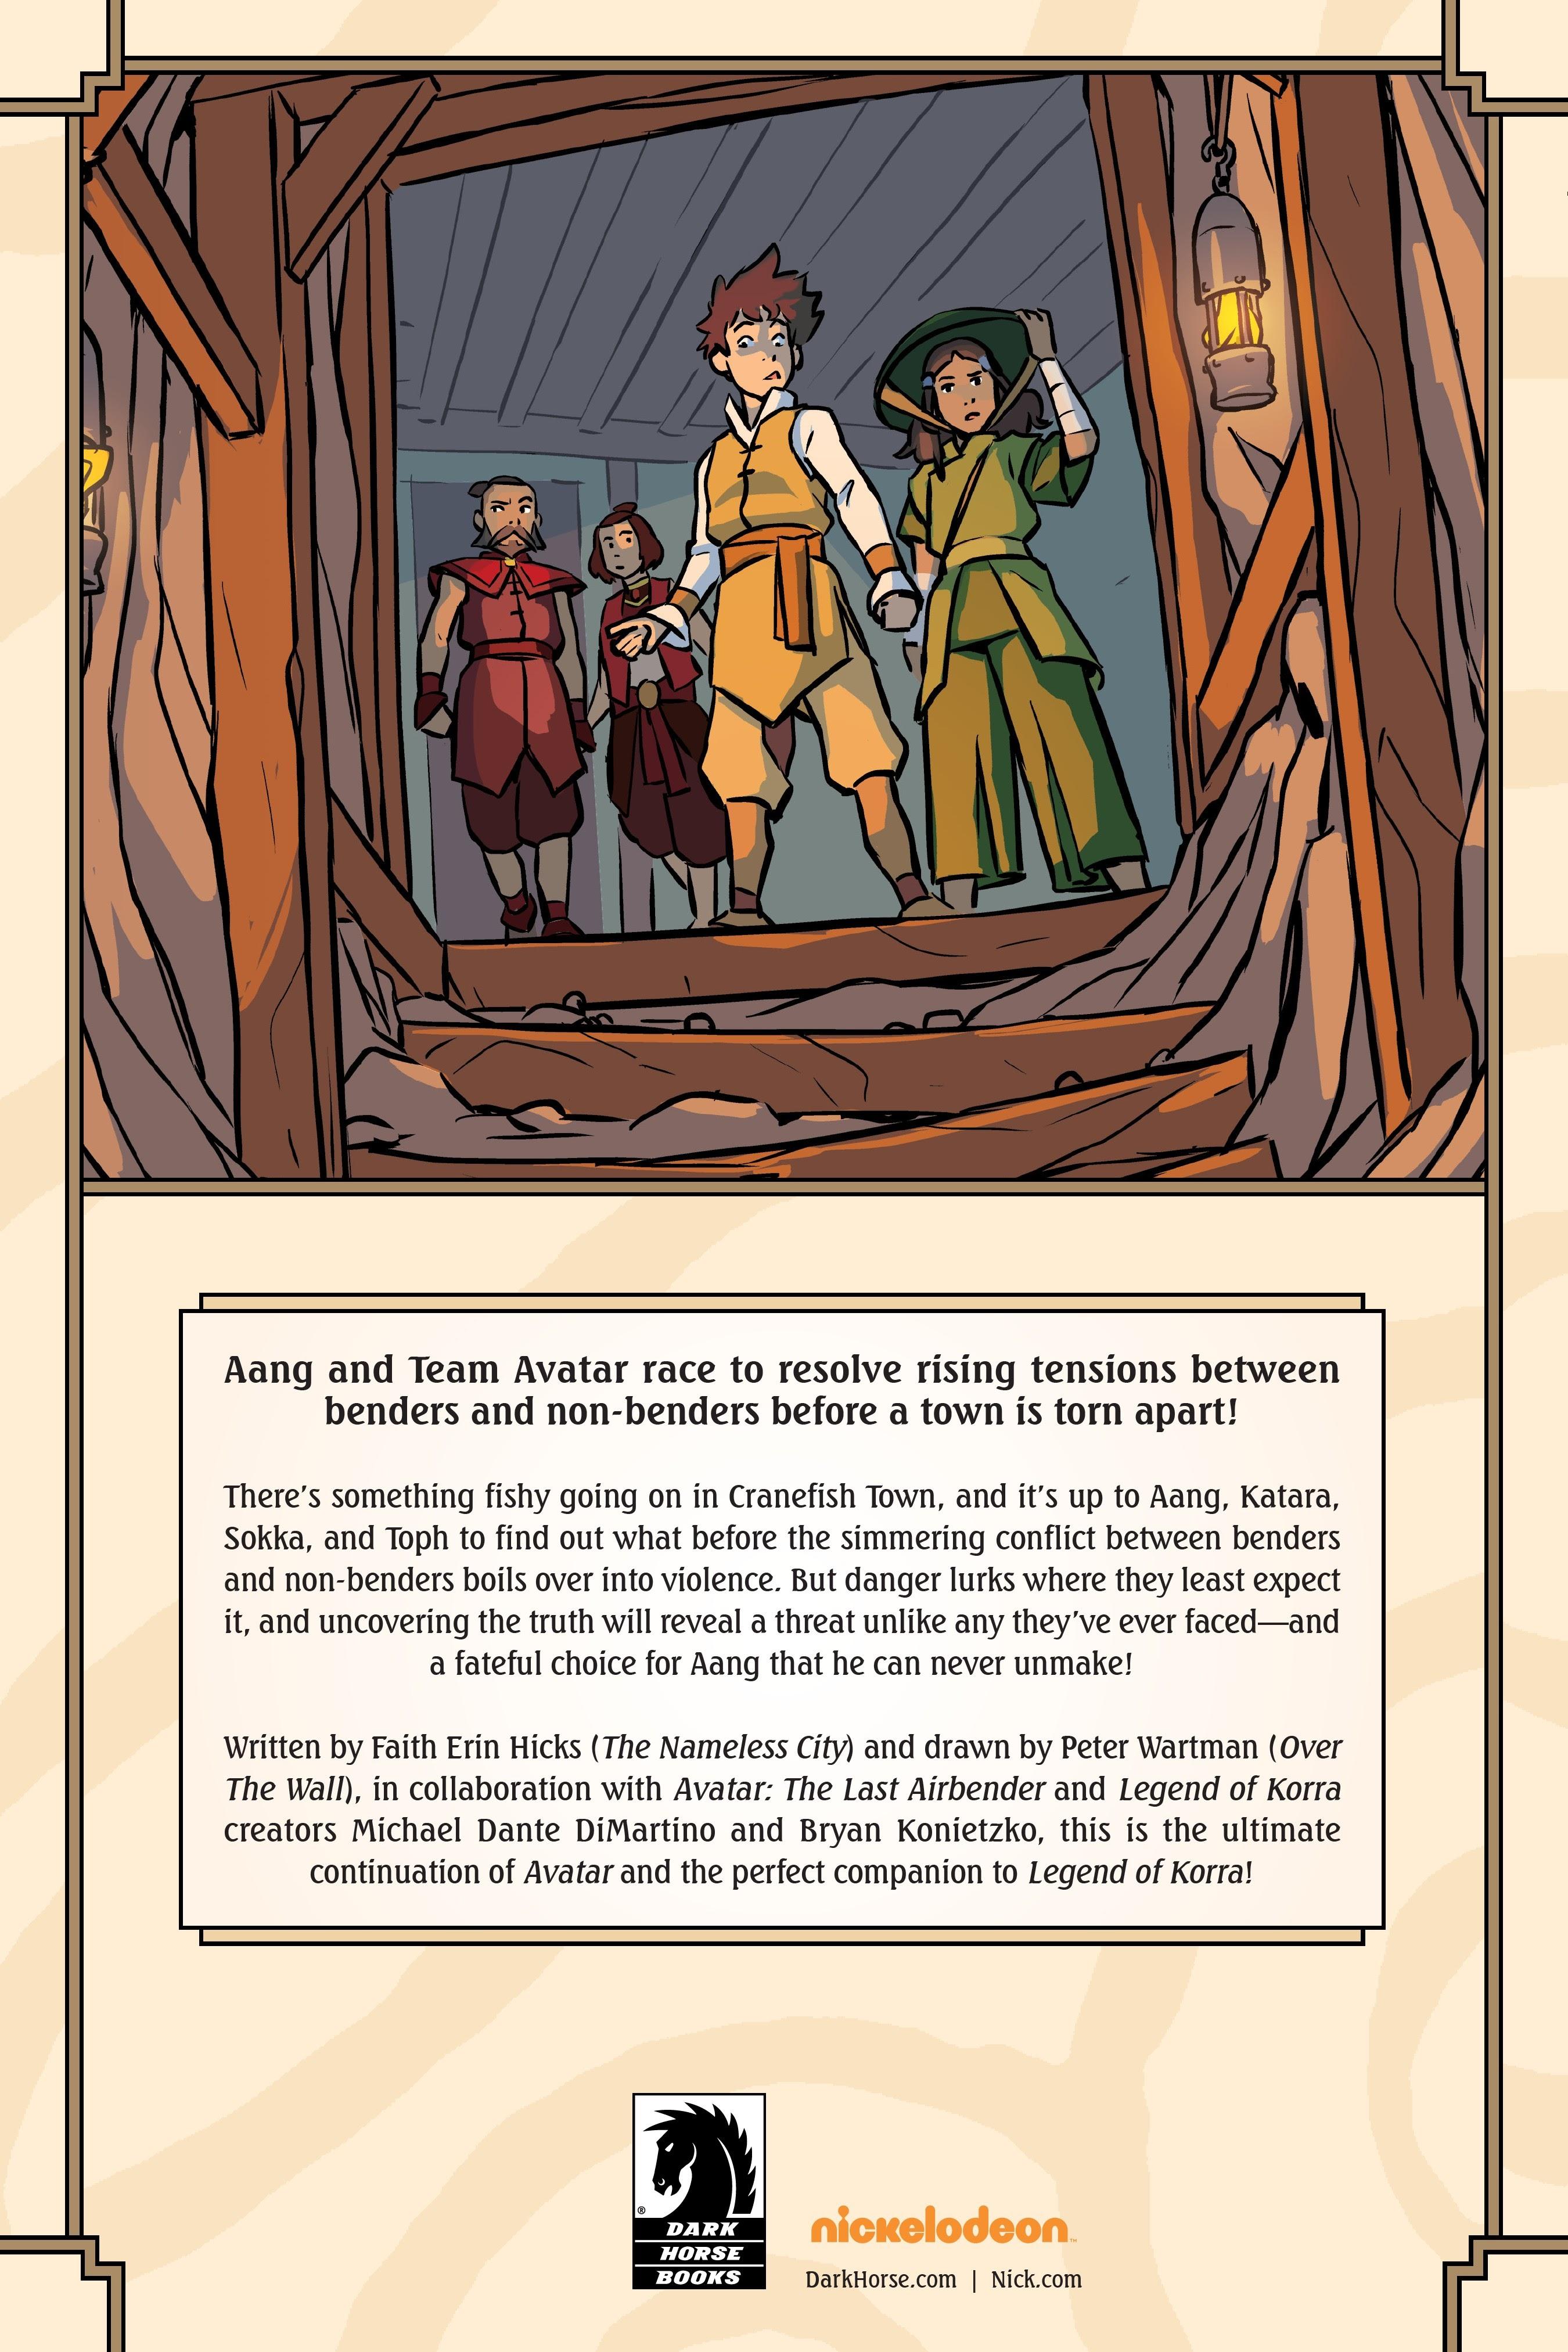 Nickelodeon Avatar: The Last Airbender - Imbalance TPB_2 Page 77